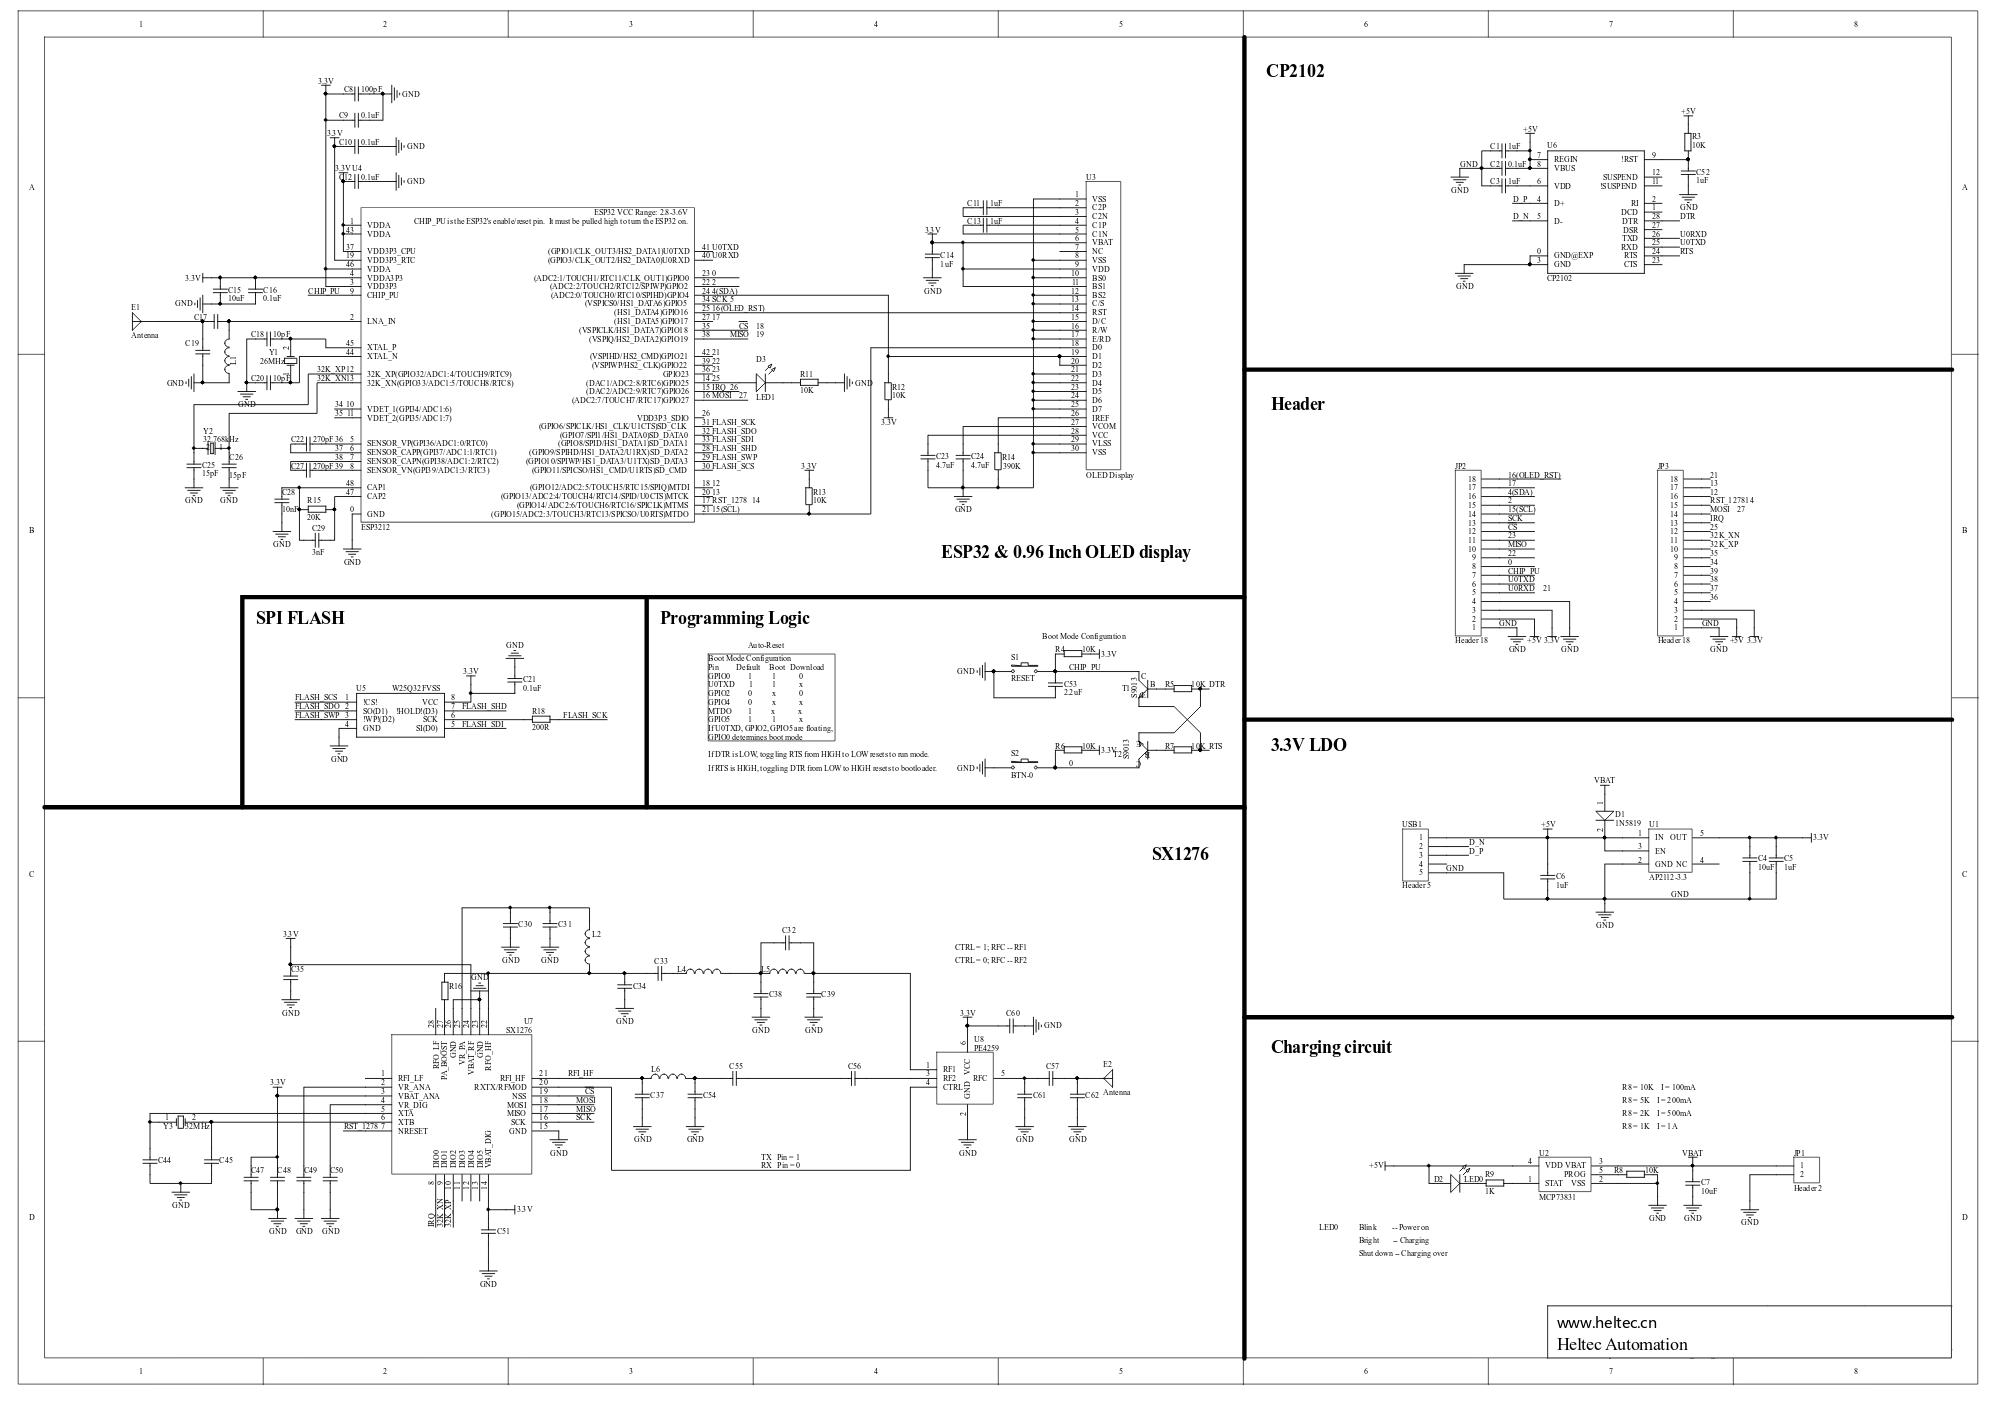 ESP32 WiFi Lora Board - deep-sleep power consumption · Issue